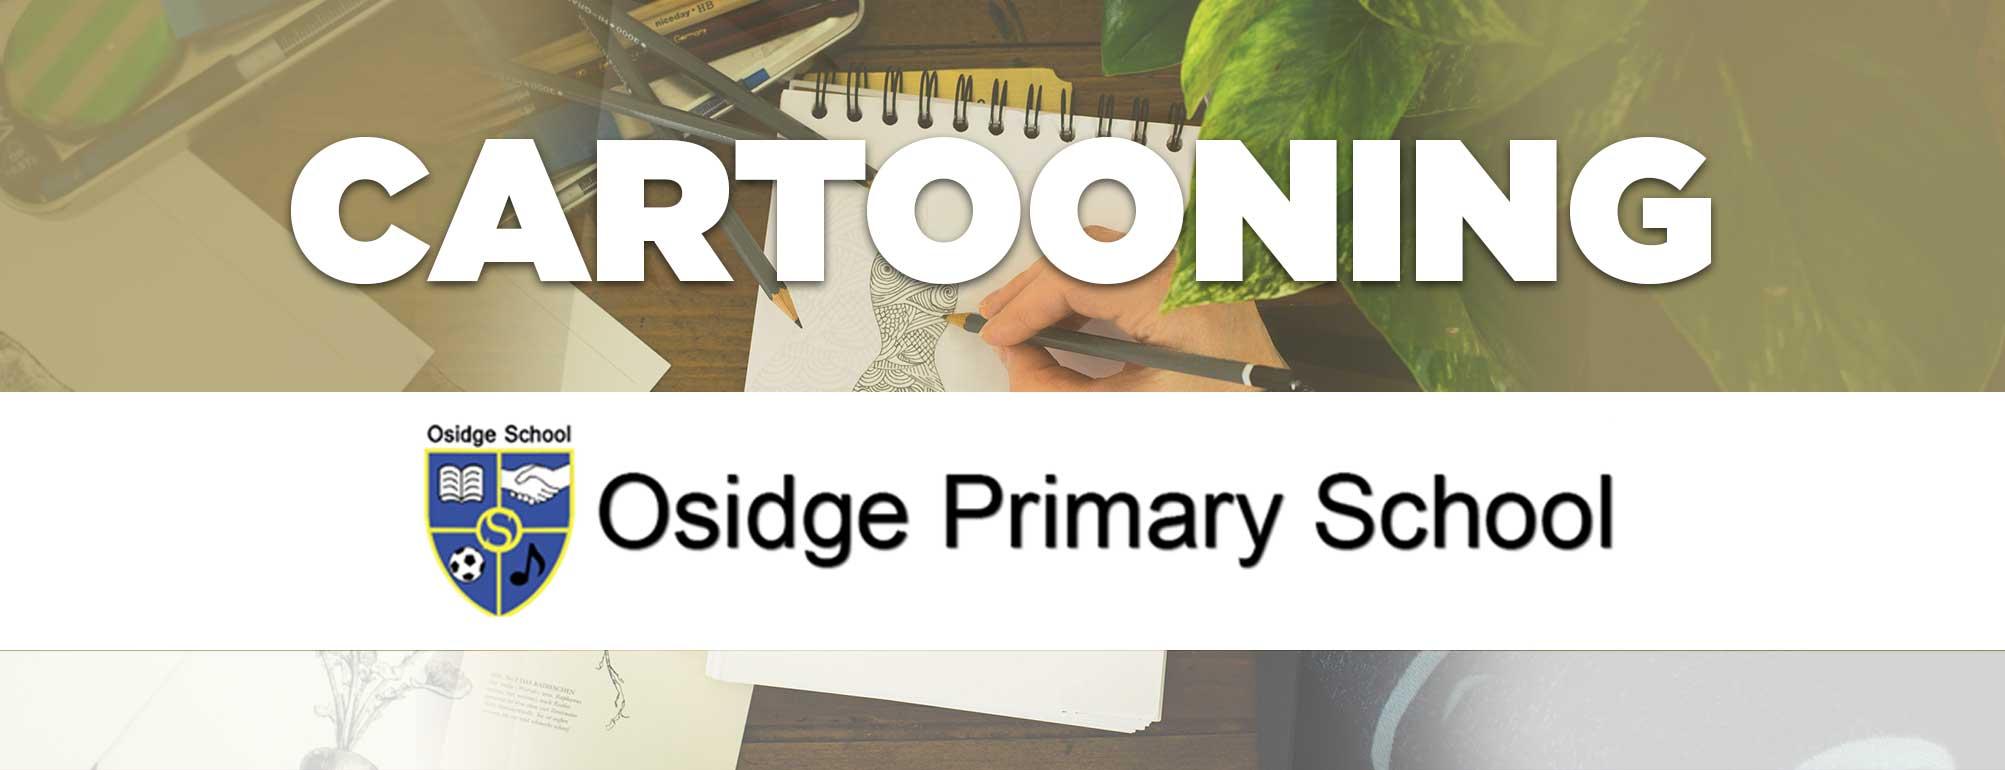 Cartooning Club - Osidge Primary School - September to December 2019